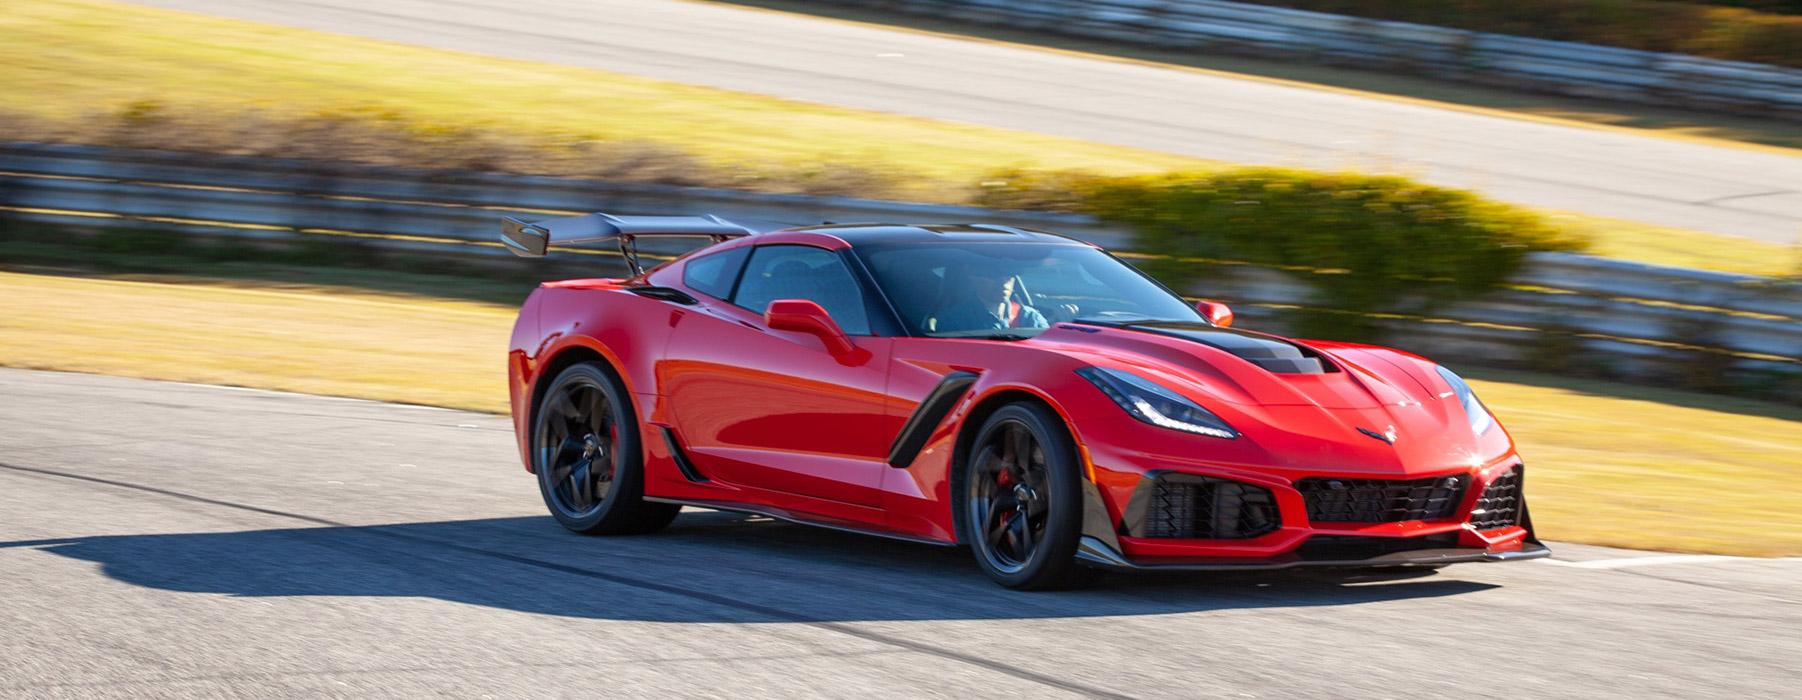 Drive a Corvette ZR1